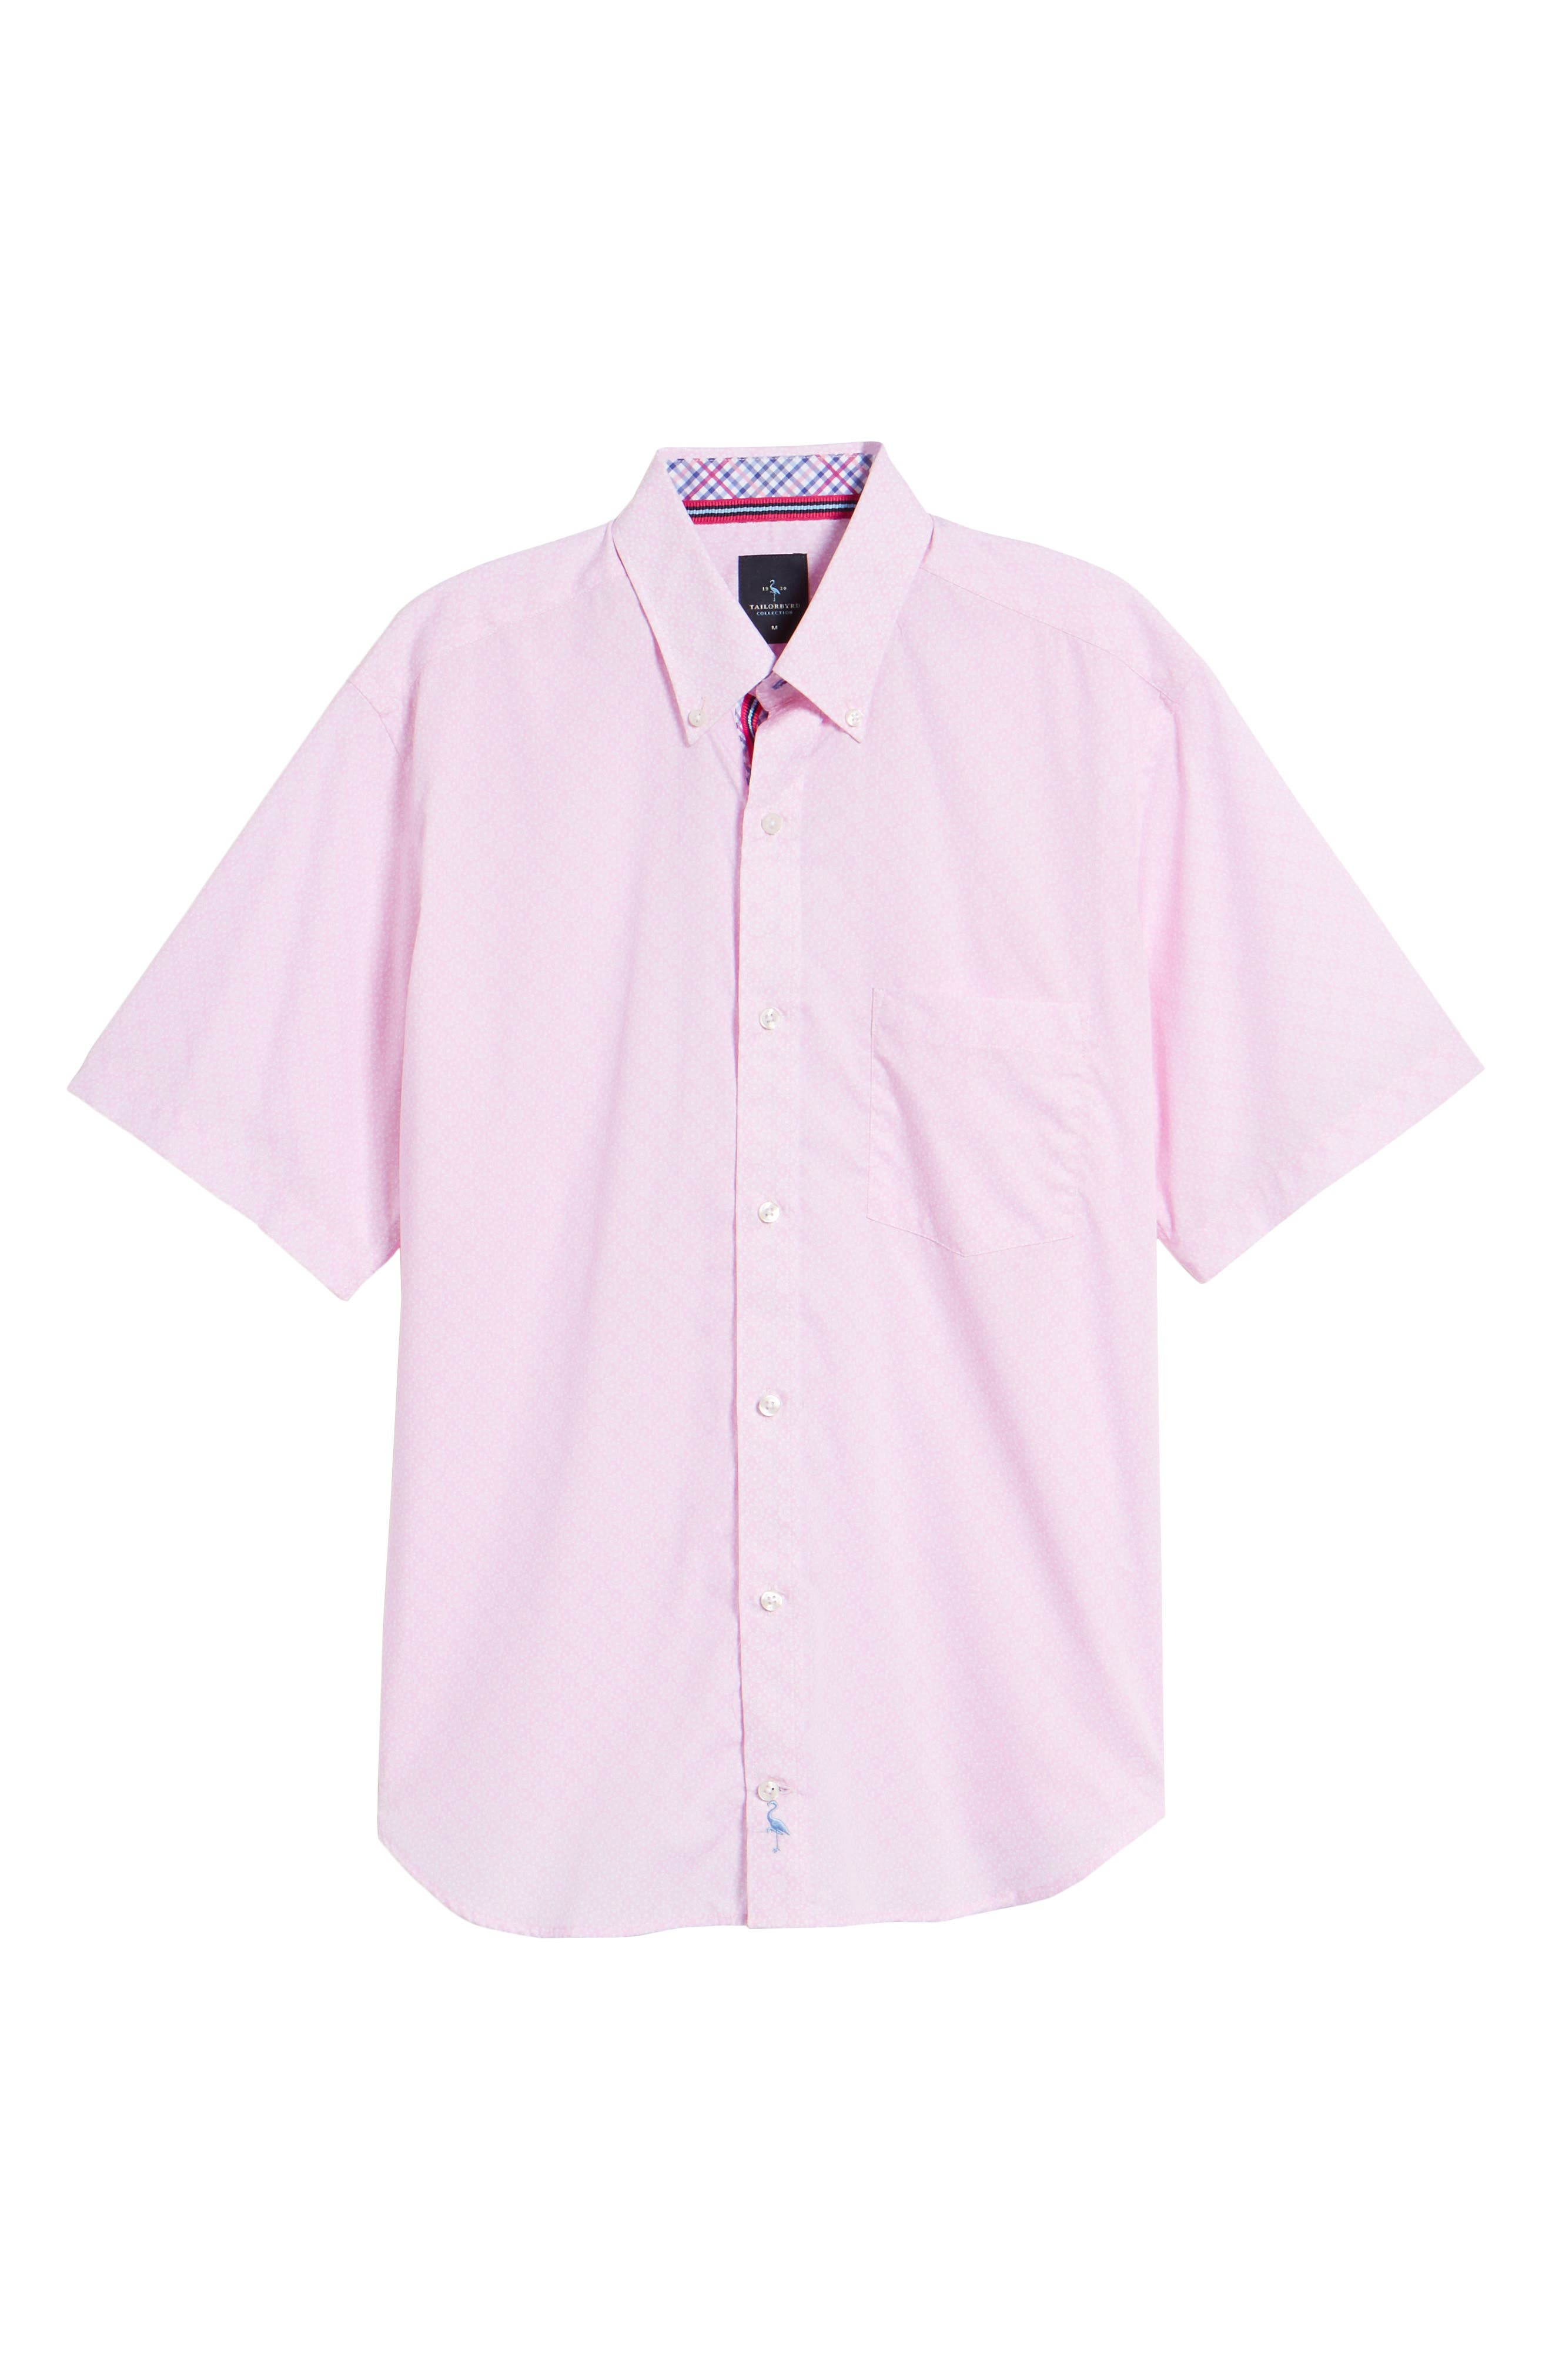 Napolean Regular Fit Medallion Sport Shirt,                             Alternate thumbnail 6, color,                             Pink